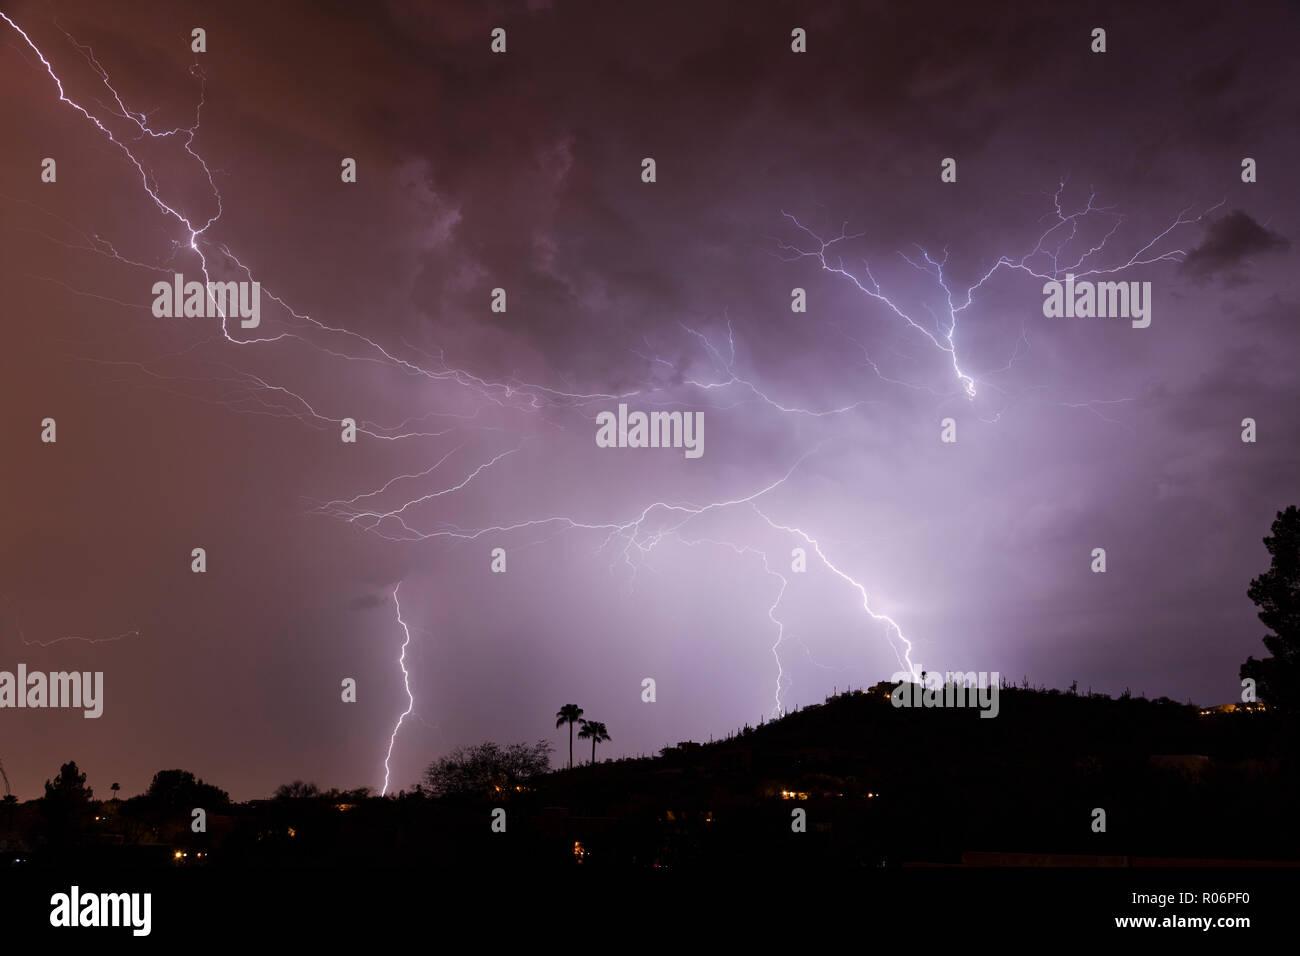 Spider Lightning, The Monsoons, Tucson, AZ - Stock Image